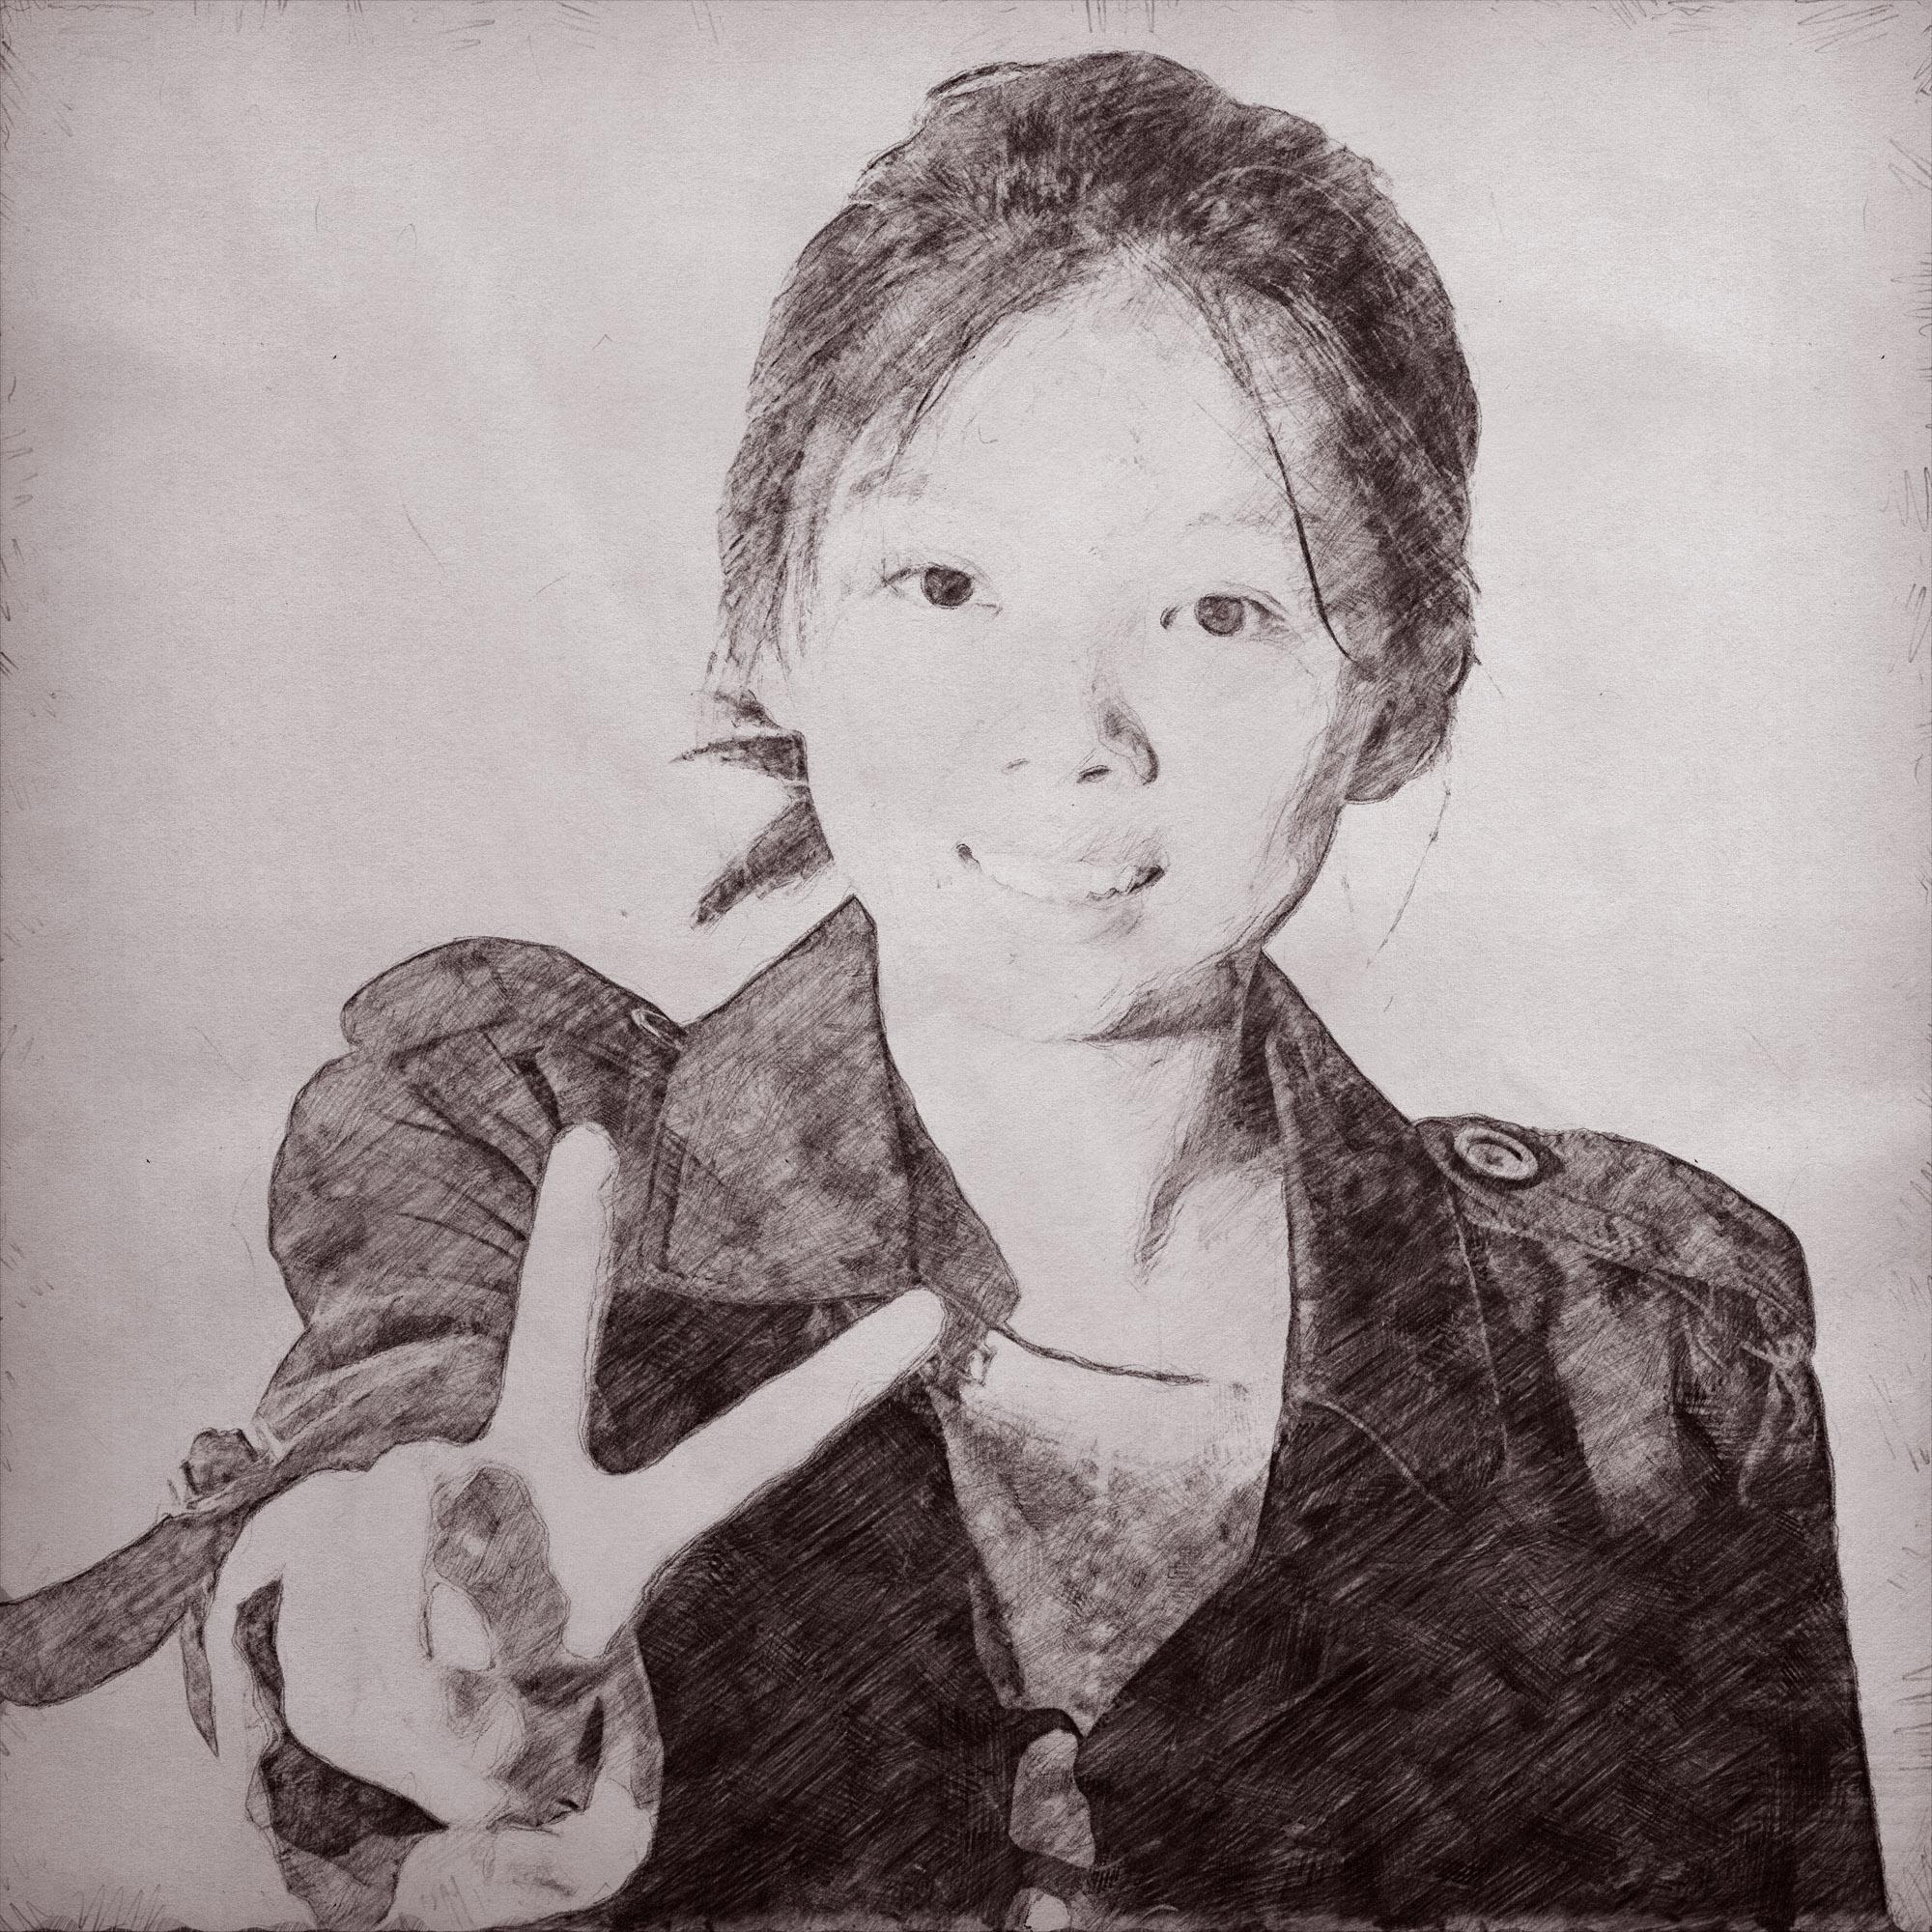 Holly_Sketch